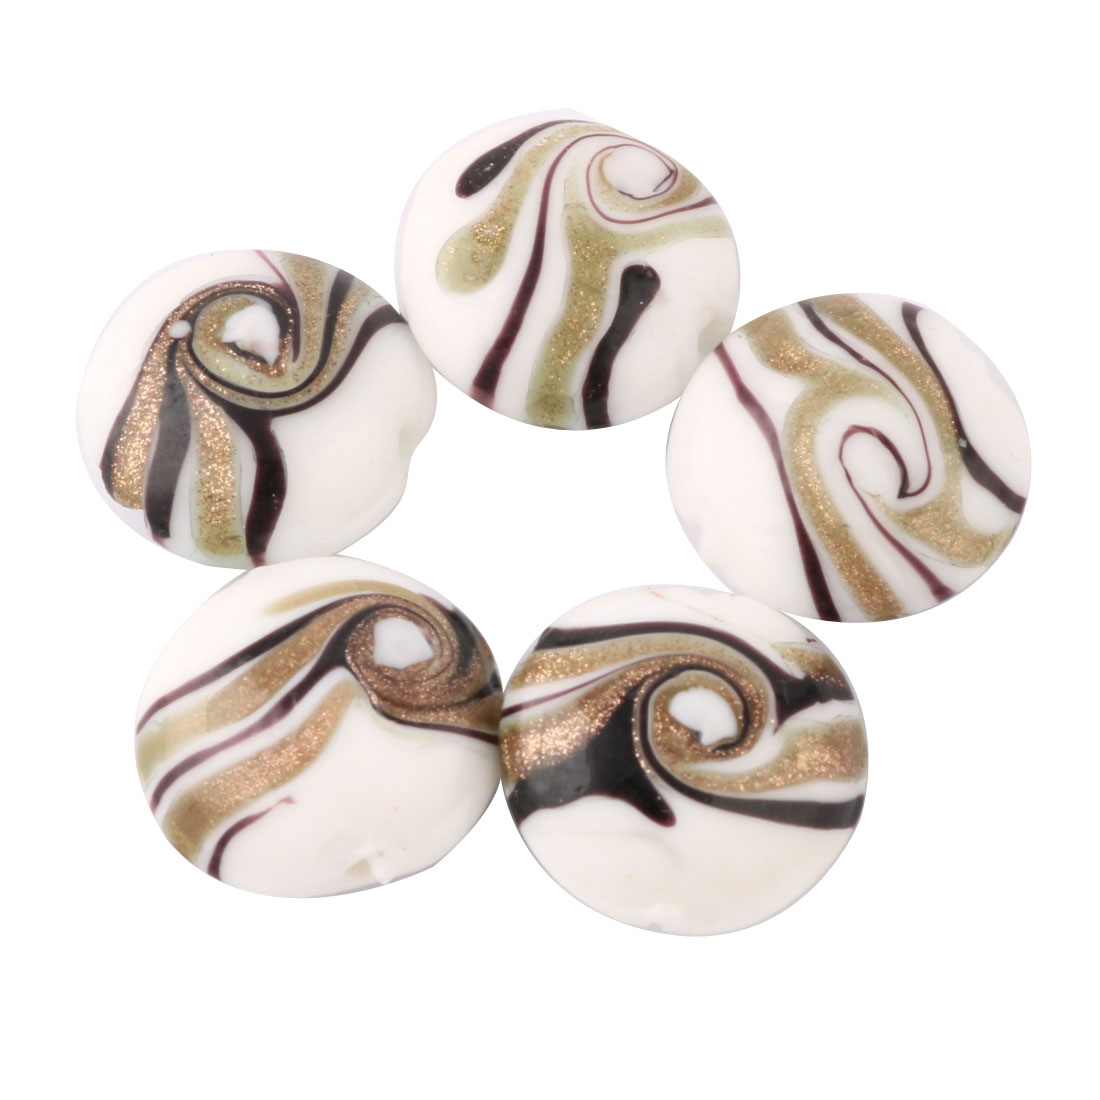 Jewelry Making Craft Flowering Prints Loose Bead DIY Bracelet 20mm Dia 5pcs